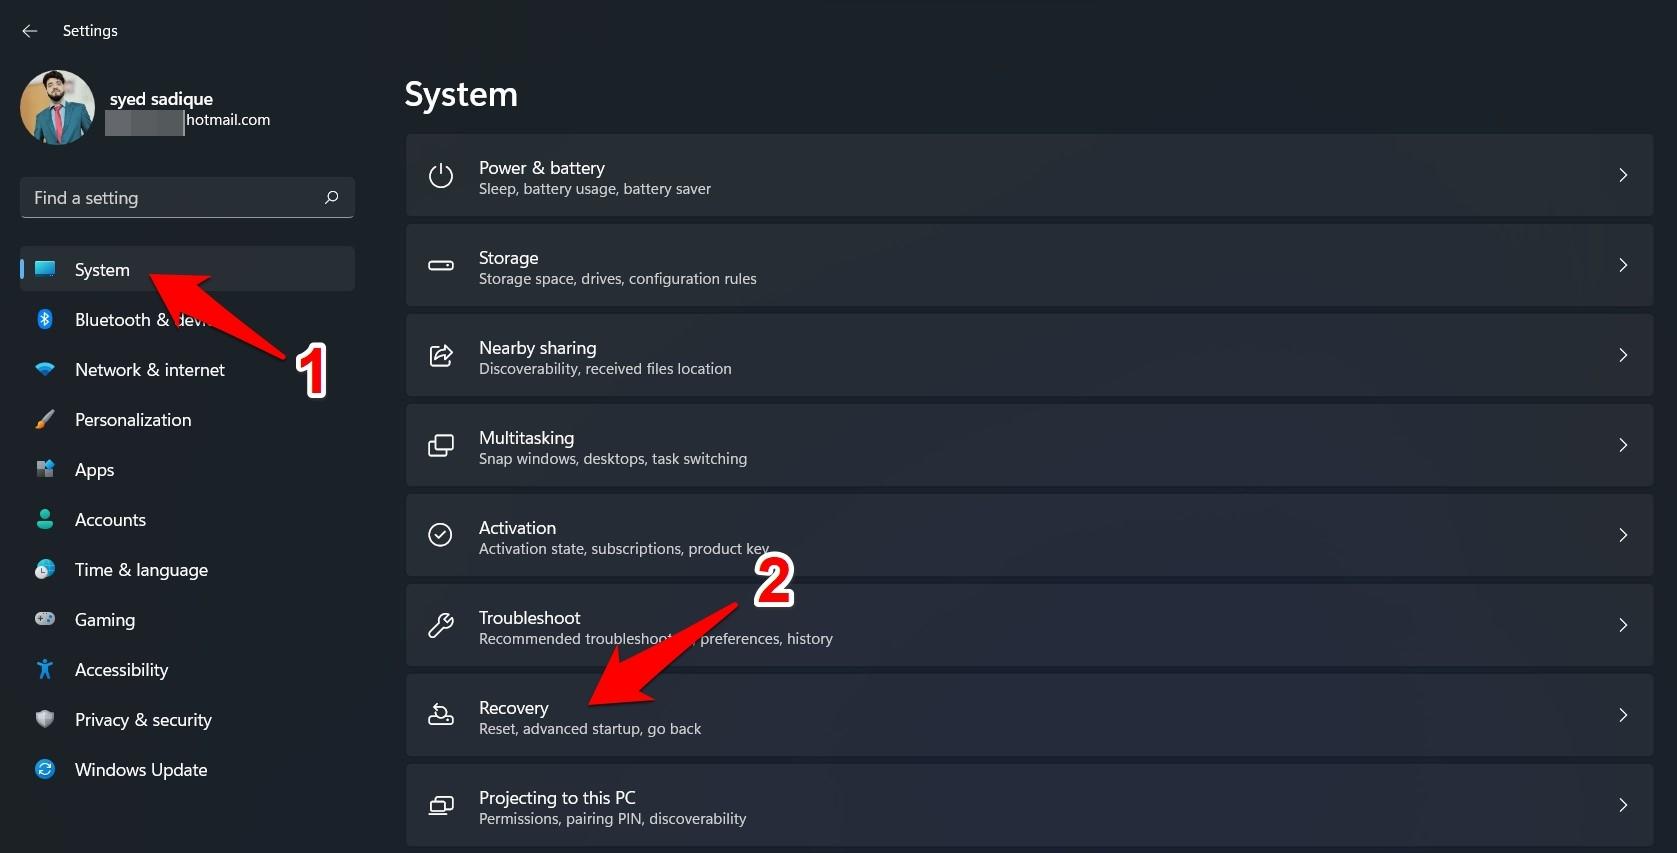 windows 11 system menu